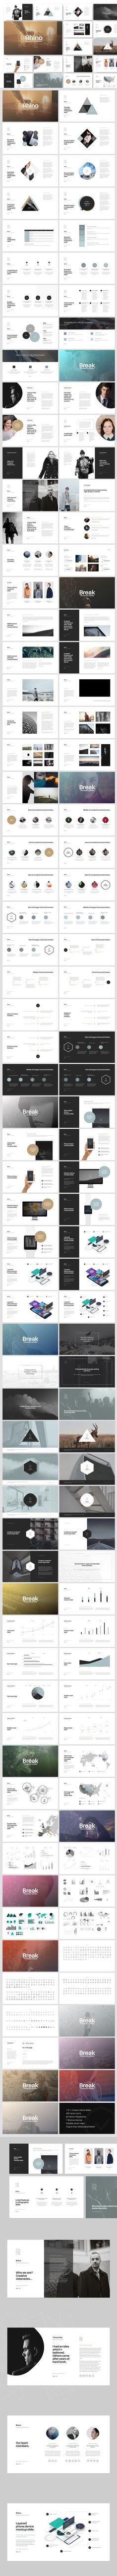 Rhino Keynote Presentation Template. Business Infographic. $20.00